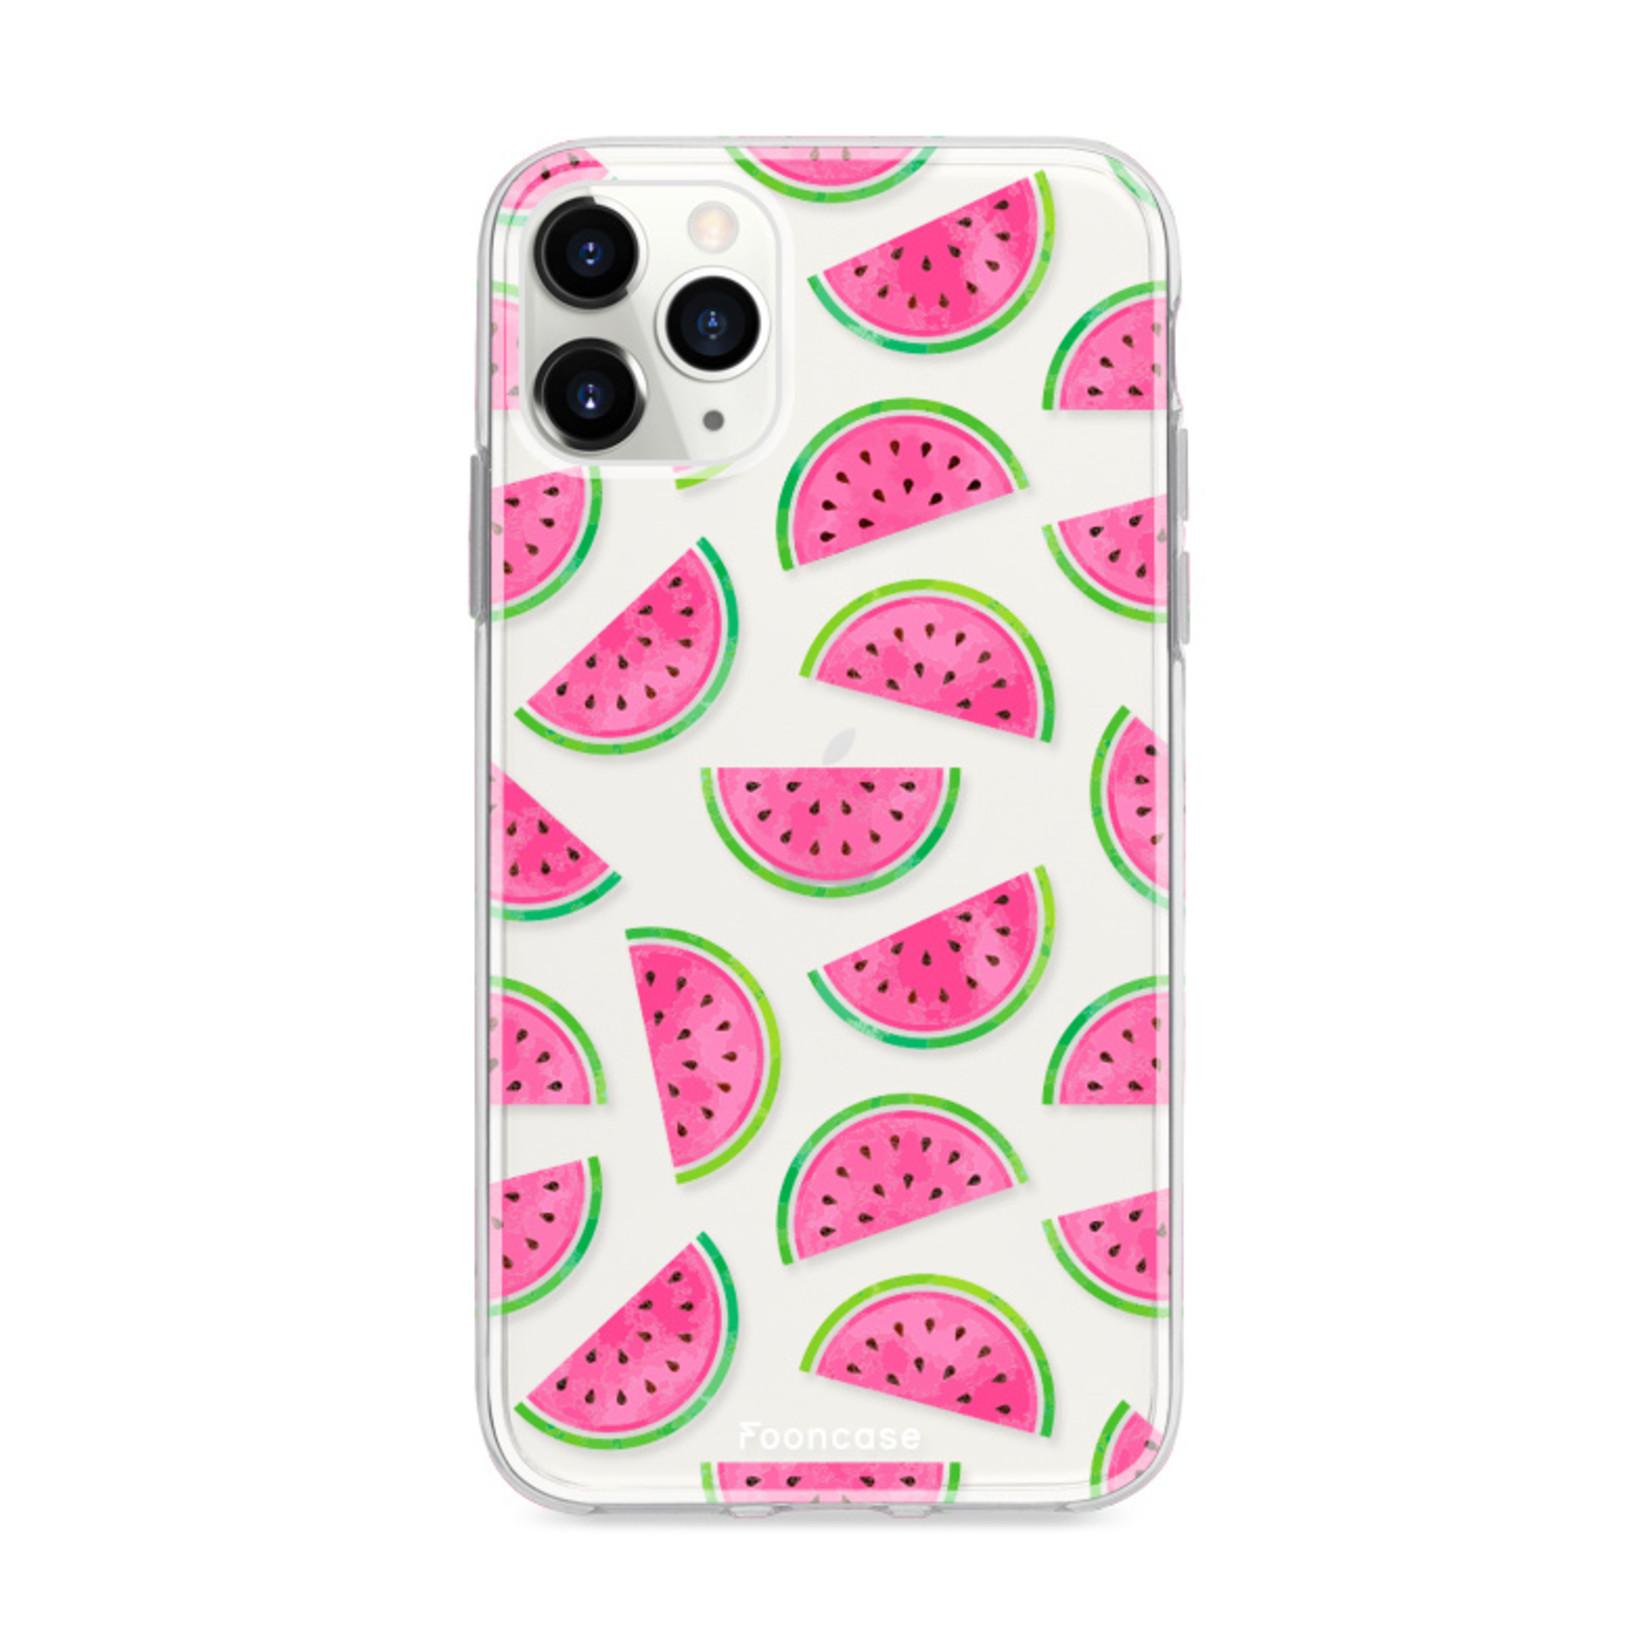 FOONCASE Iphone 11 Pro Max Handyhülle - Wassermelone